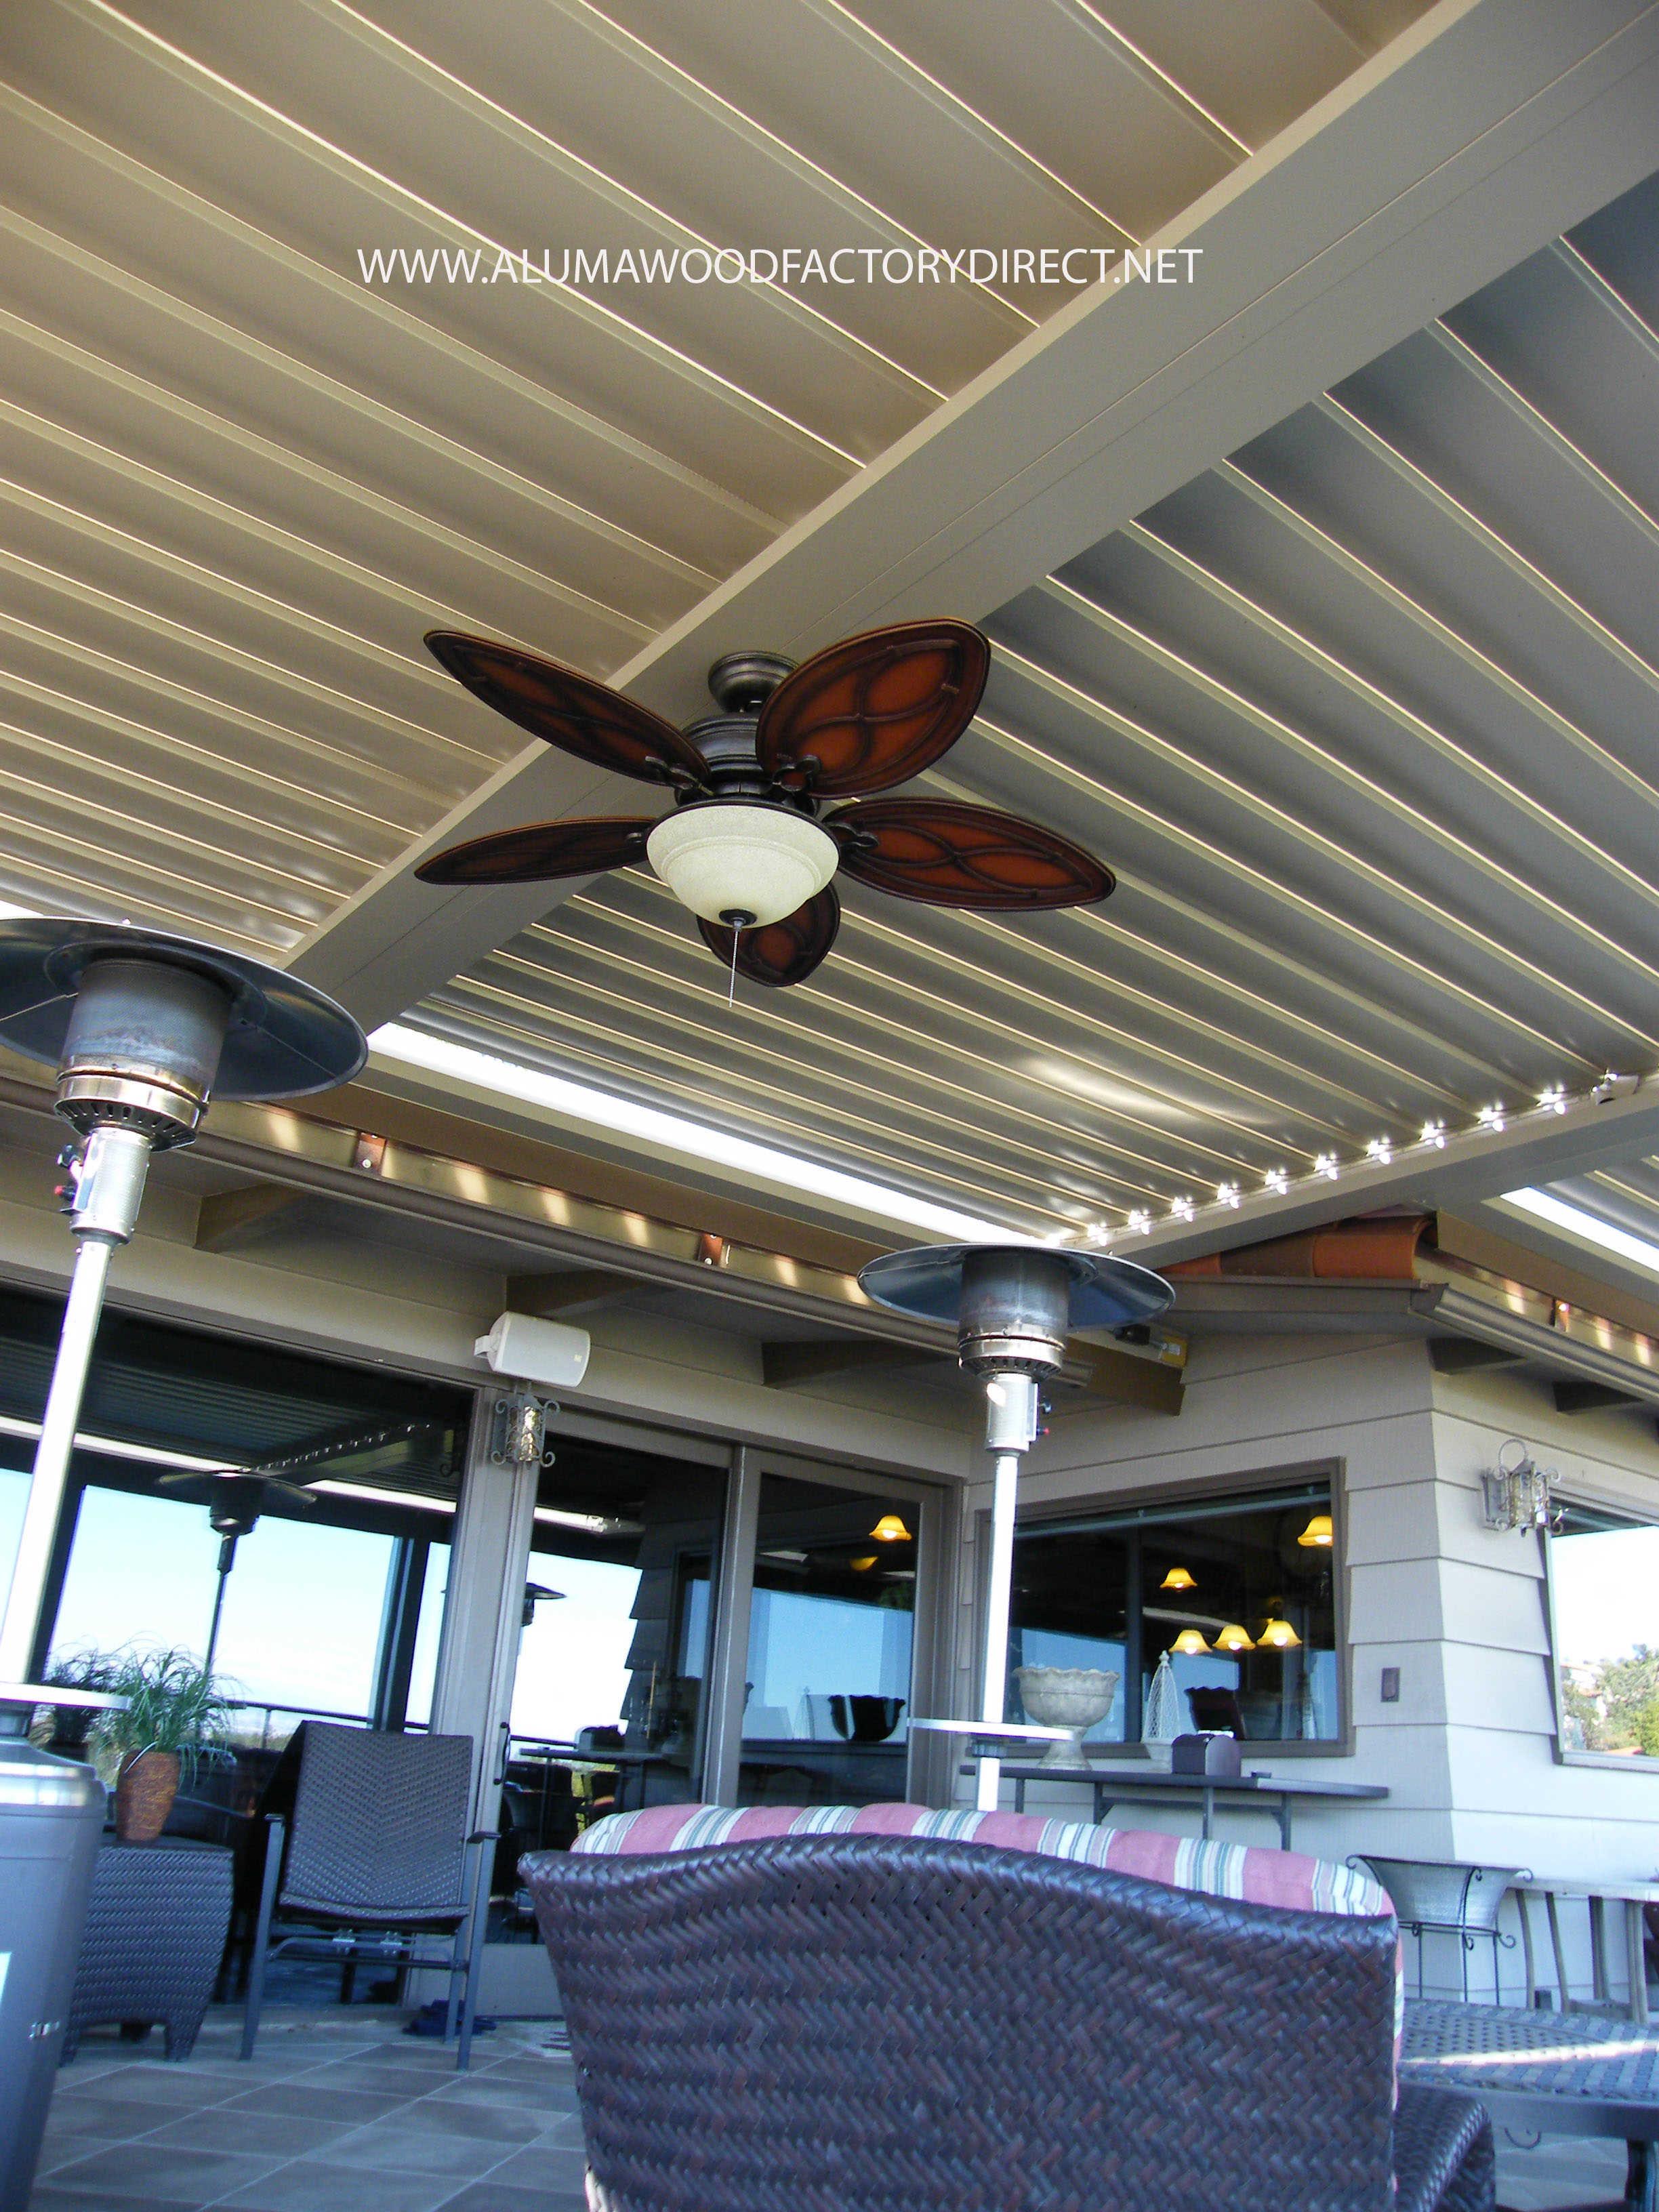 alumawood factory direct patio covers